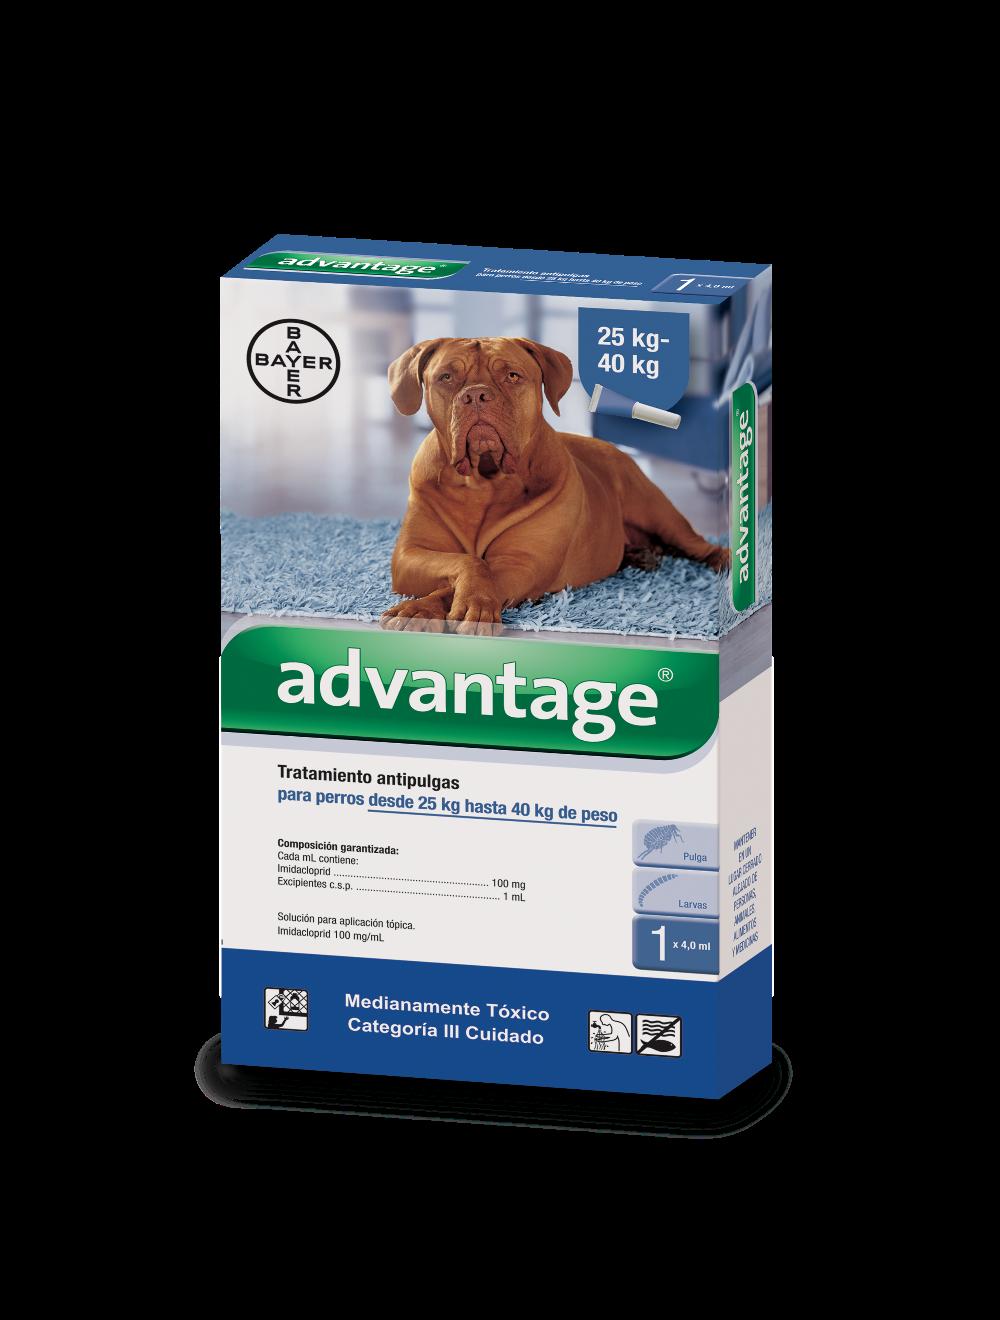 Antipulgas Advantage Pipeta para perros - Ciudaddemascotas.com